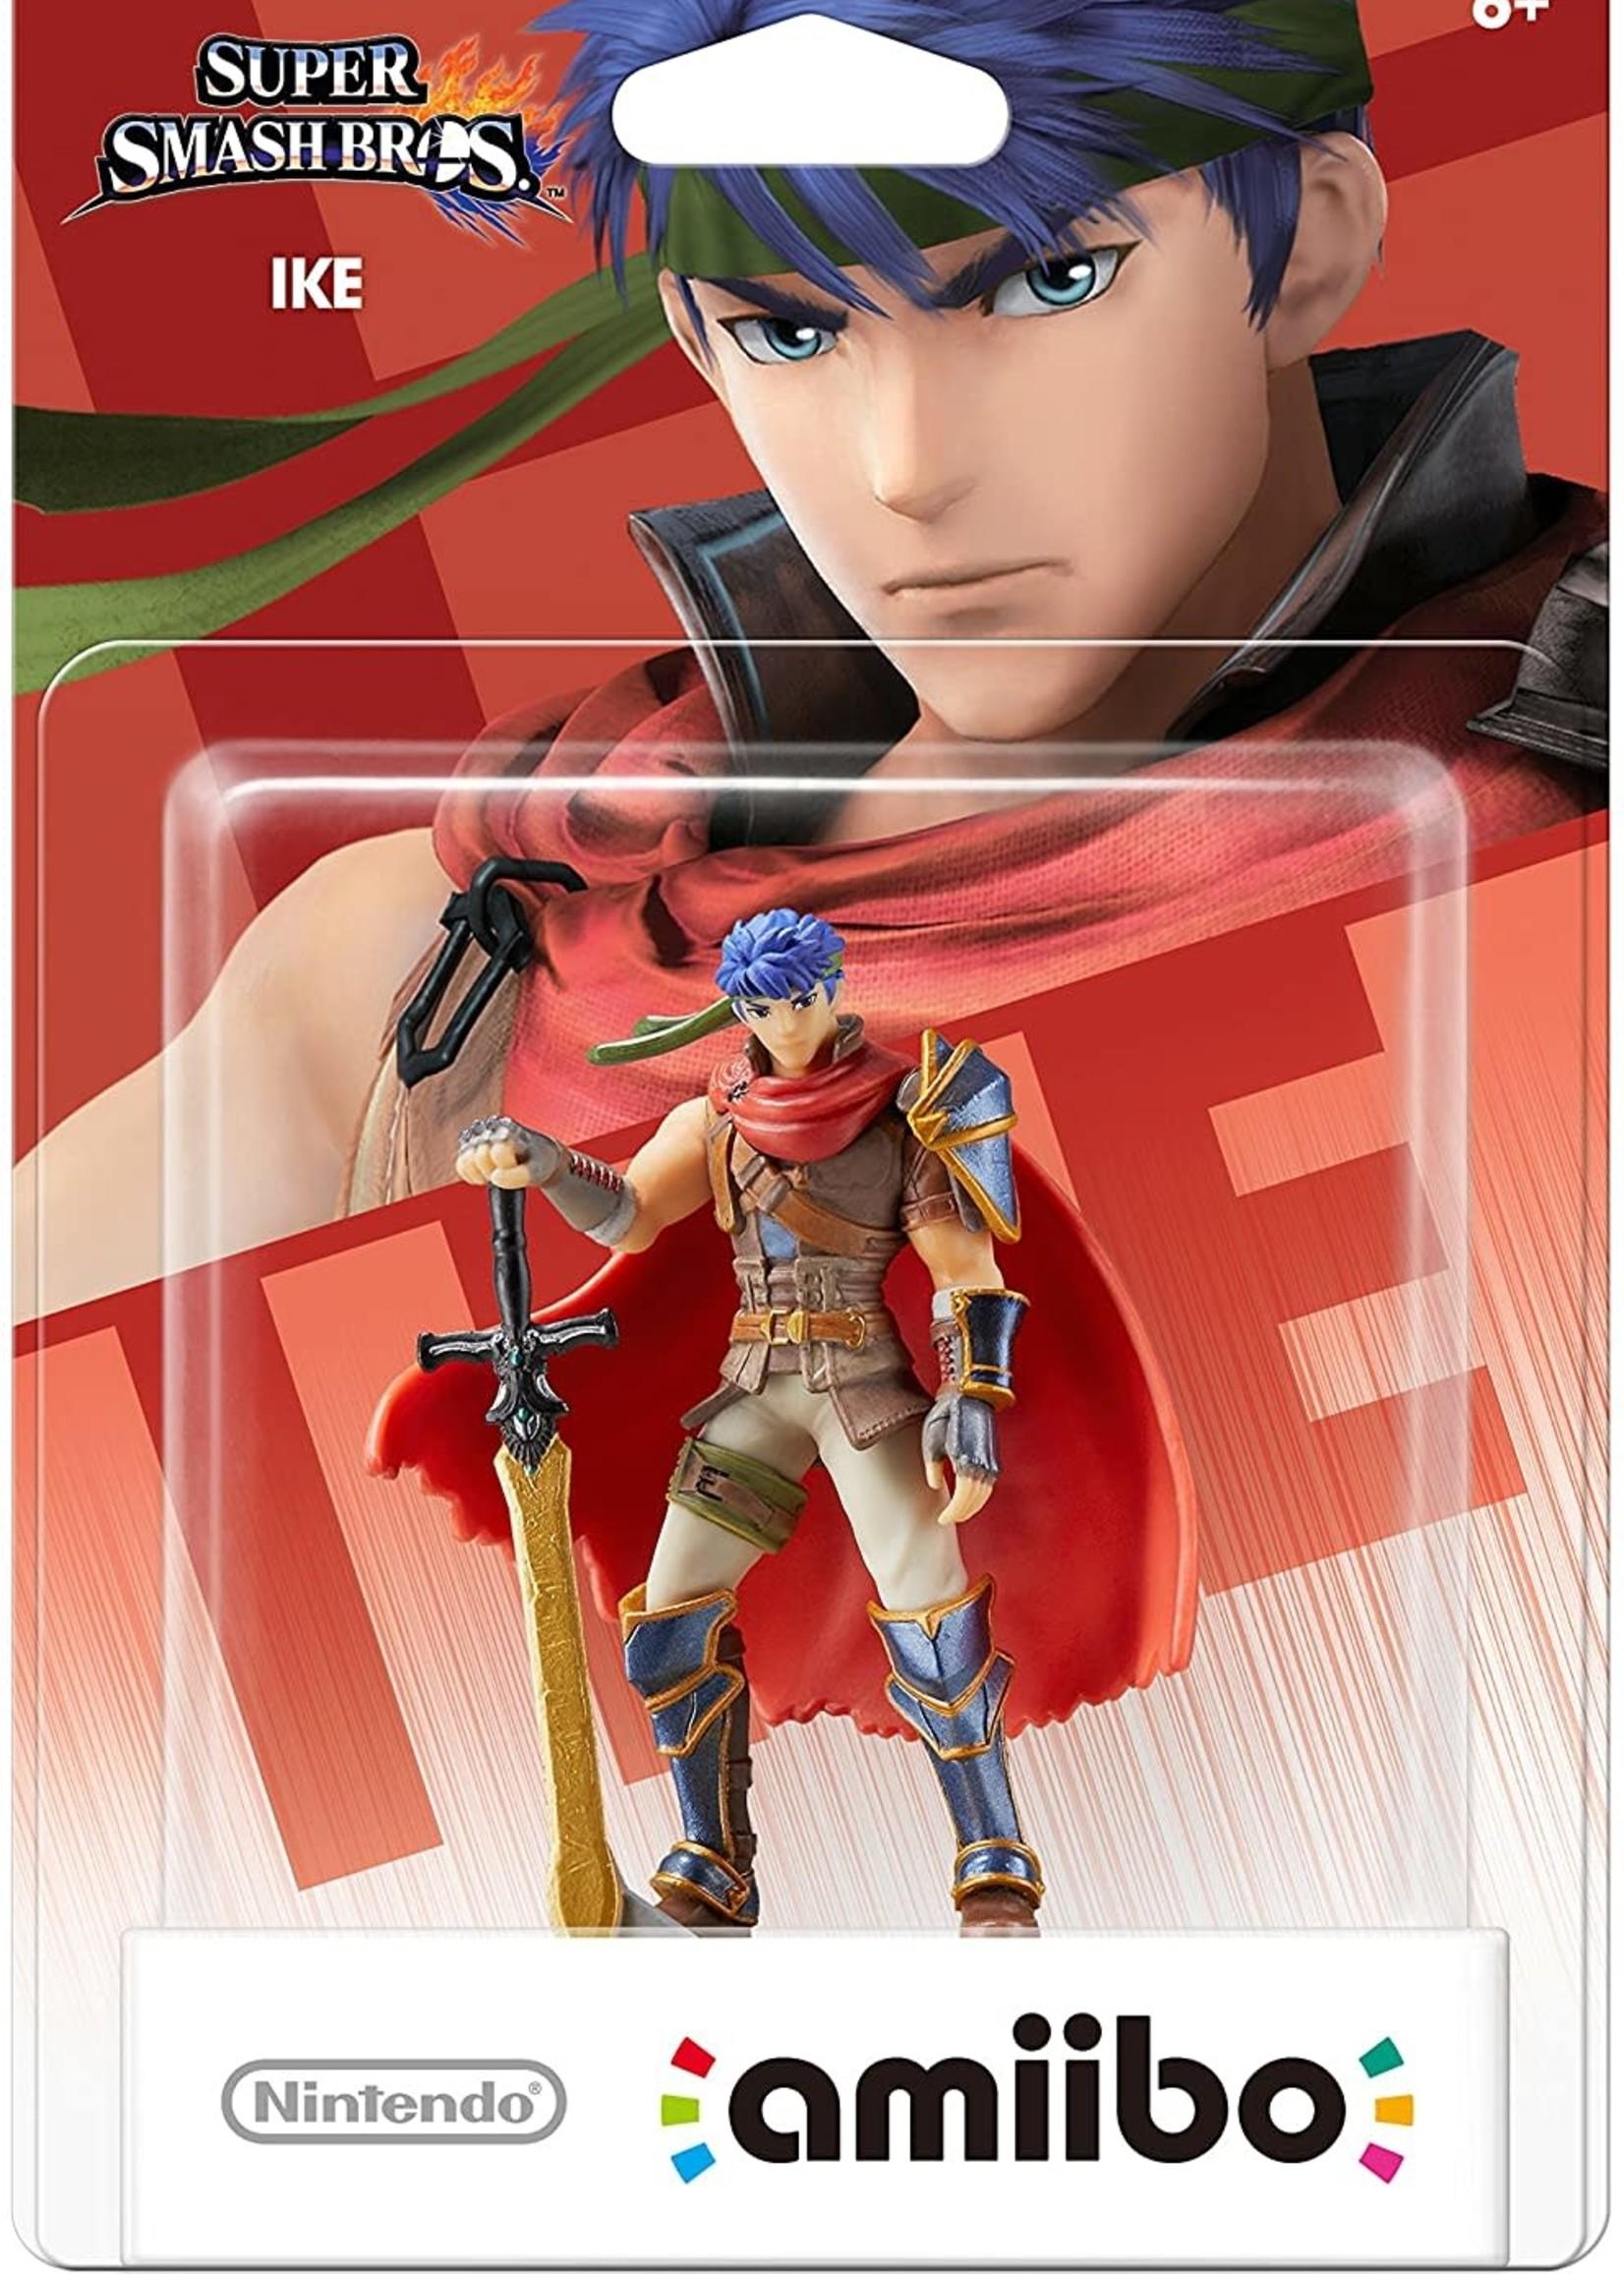 Nintendo Amiibo 'Collection Super Smash Bros' - Ike